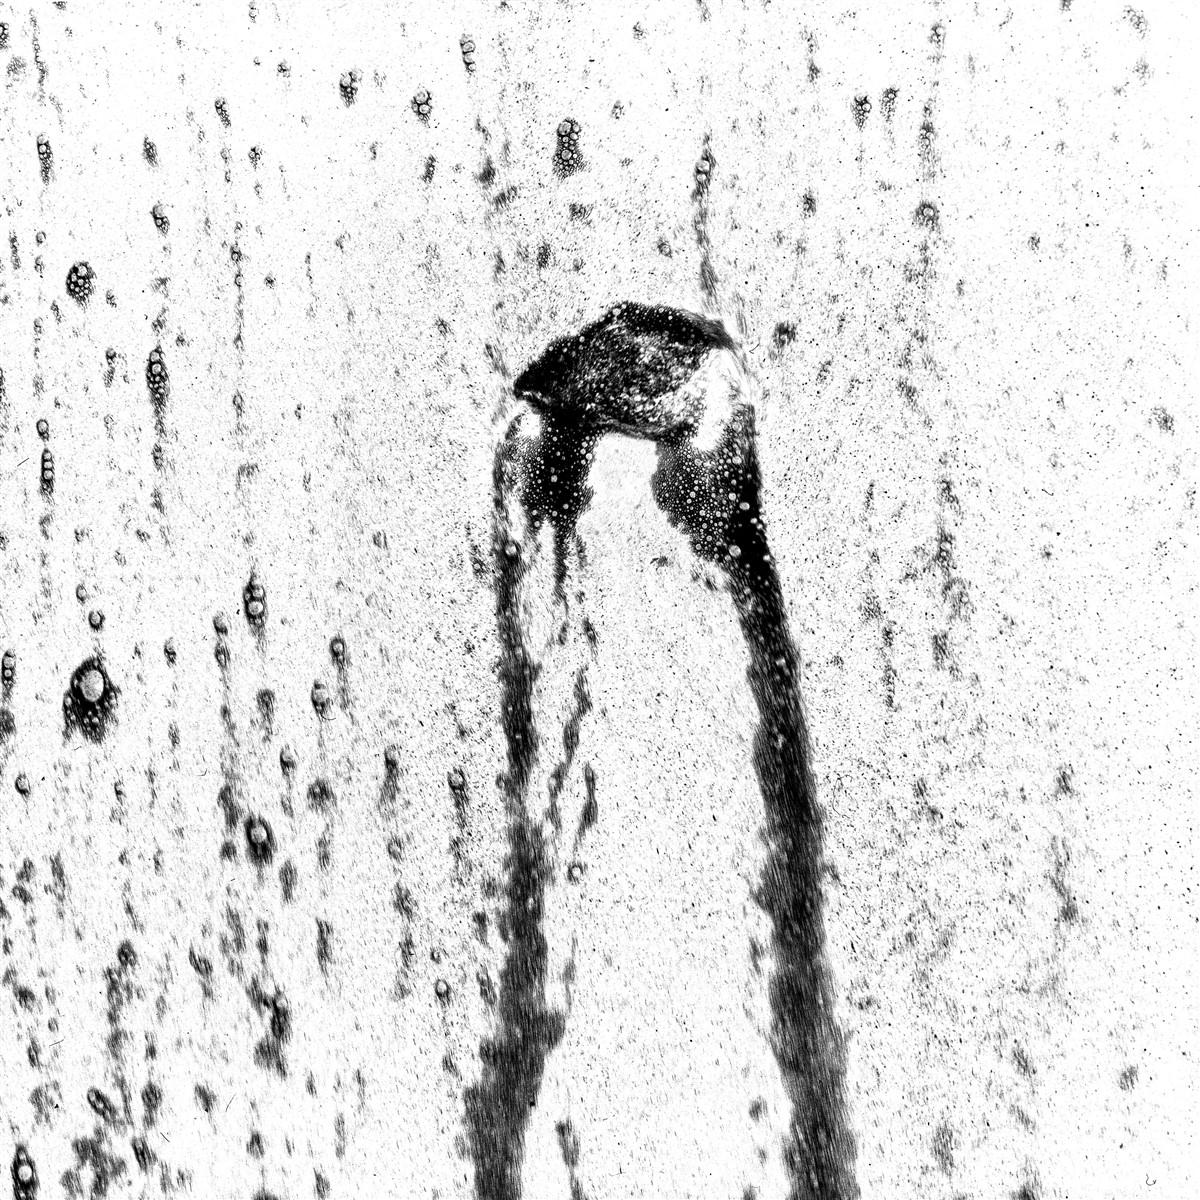 Riccardo Squillantini, Eruption II, Martian Age series